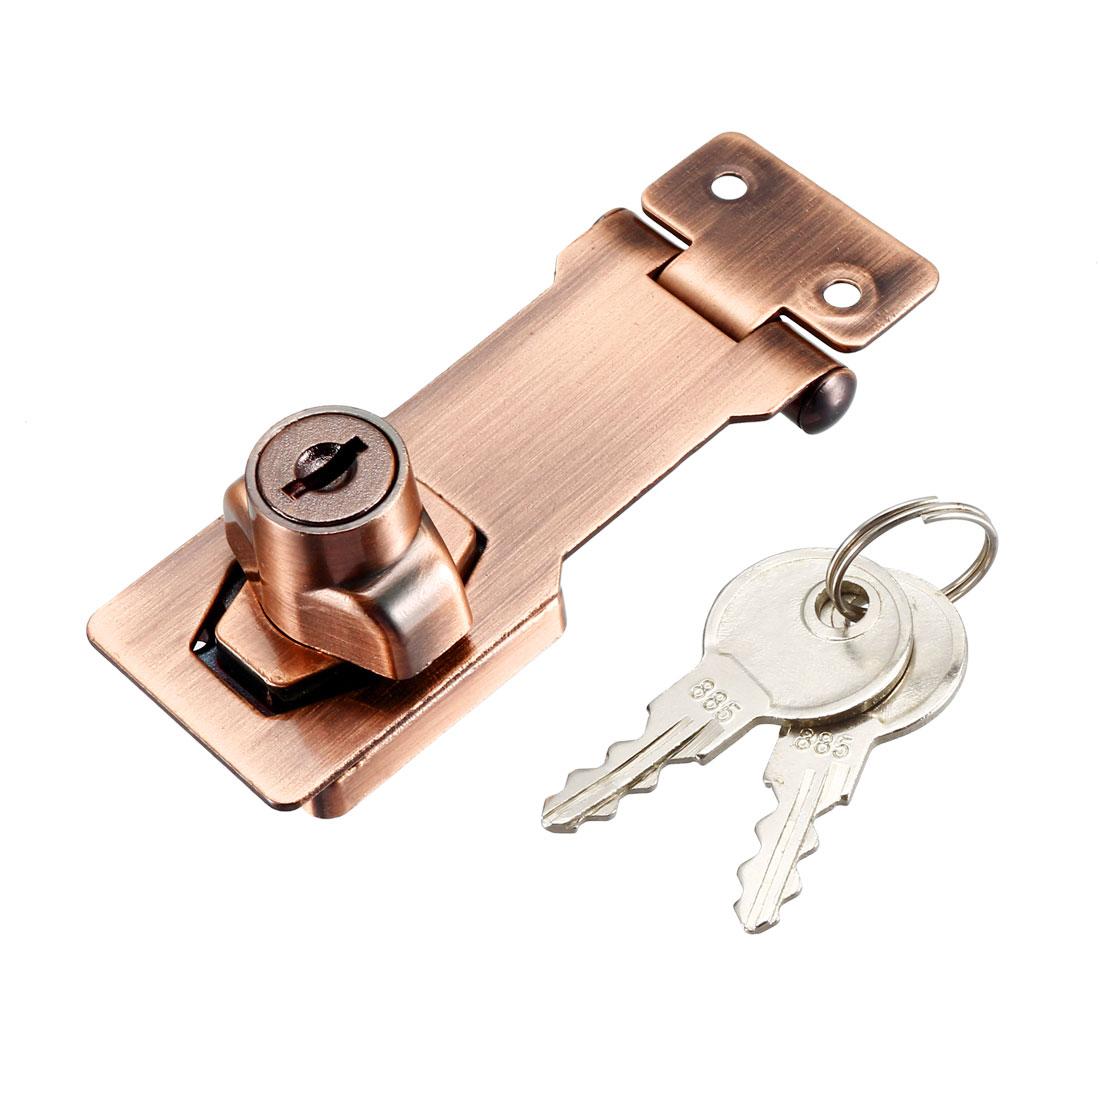 Keyed Hasp Lock 94mm Twist Knob Keyed Locking Hasp Red Copper Tone